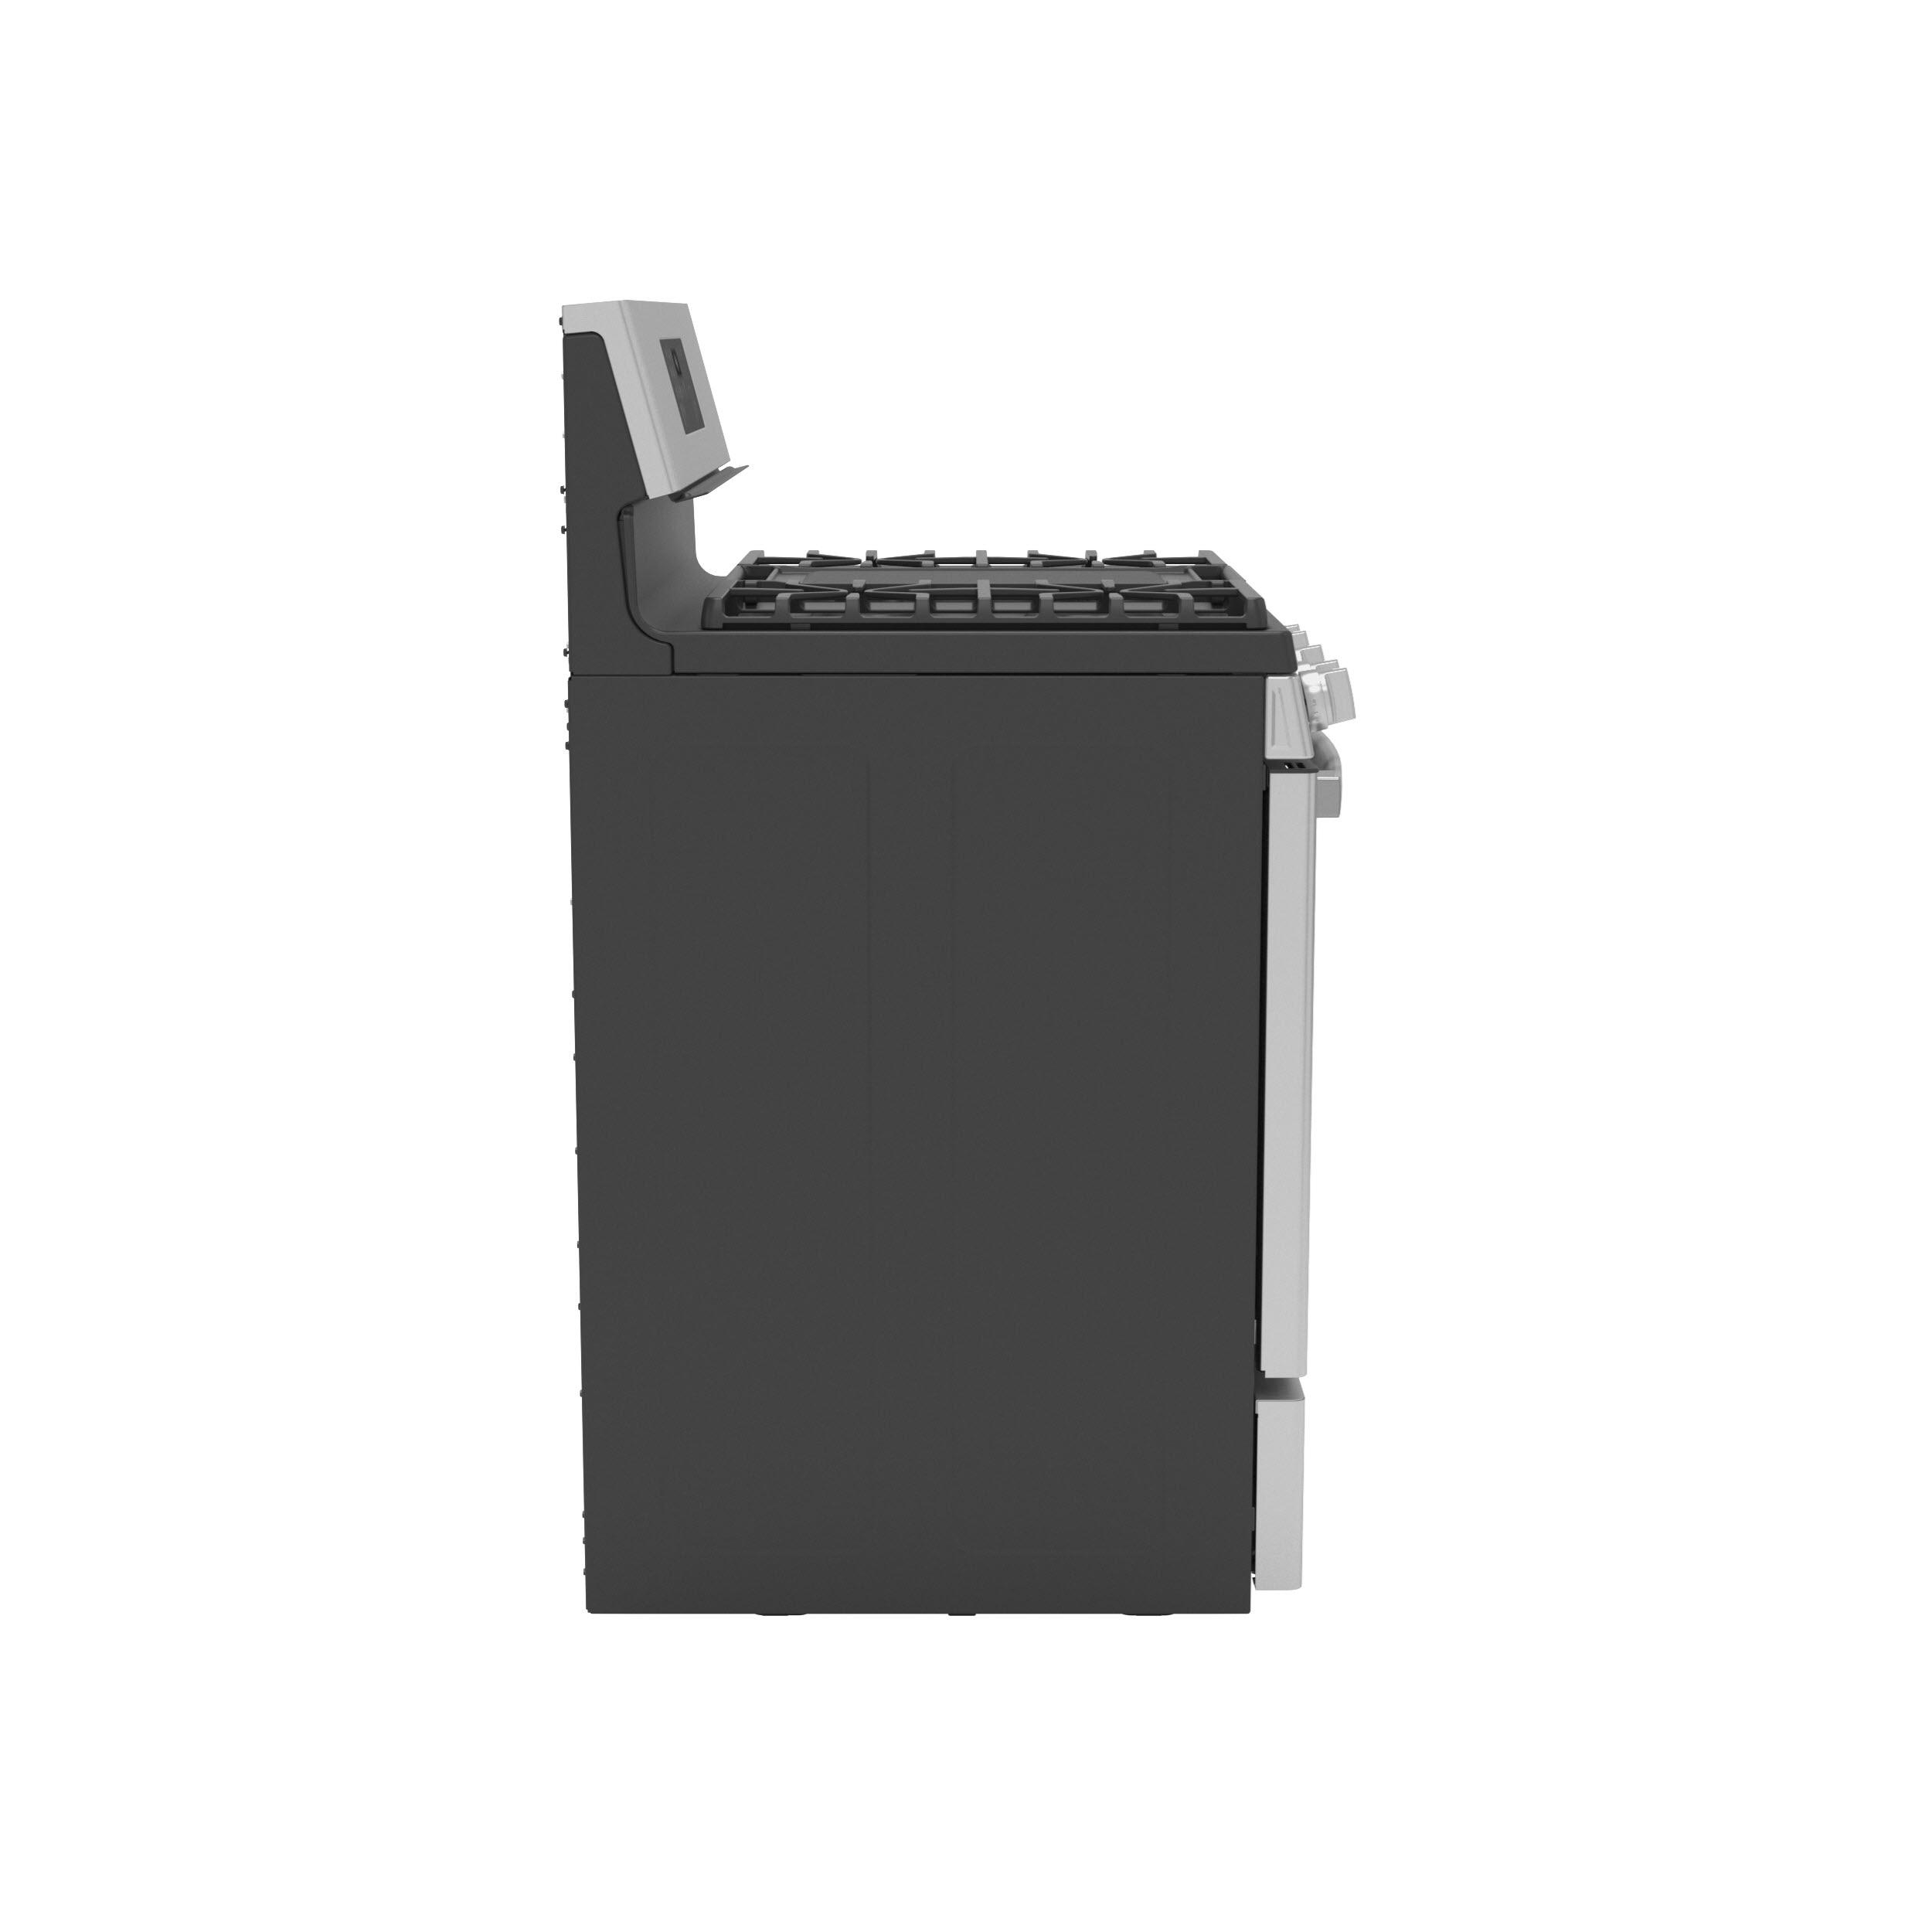 "Model: P2B935YPFS | GE Profile GE Profile™ 30"" Free-Standing Self Clean Dual-Fuel Fingerprint Resistant Range with Storage Drawer"